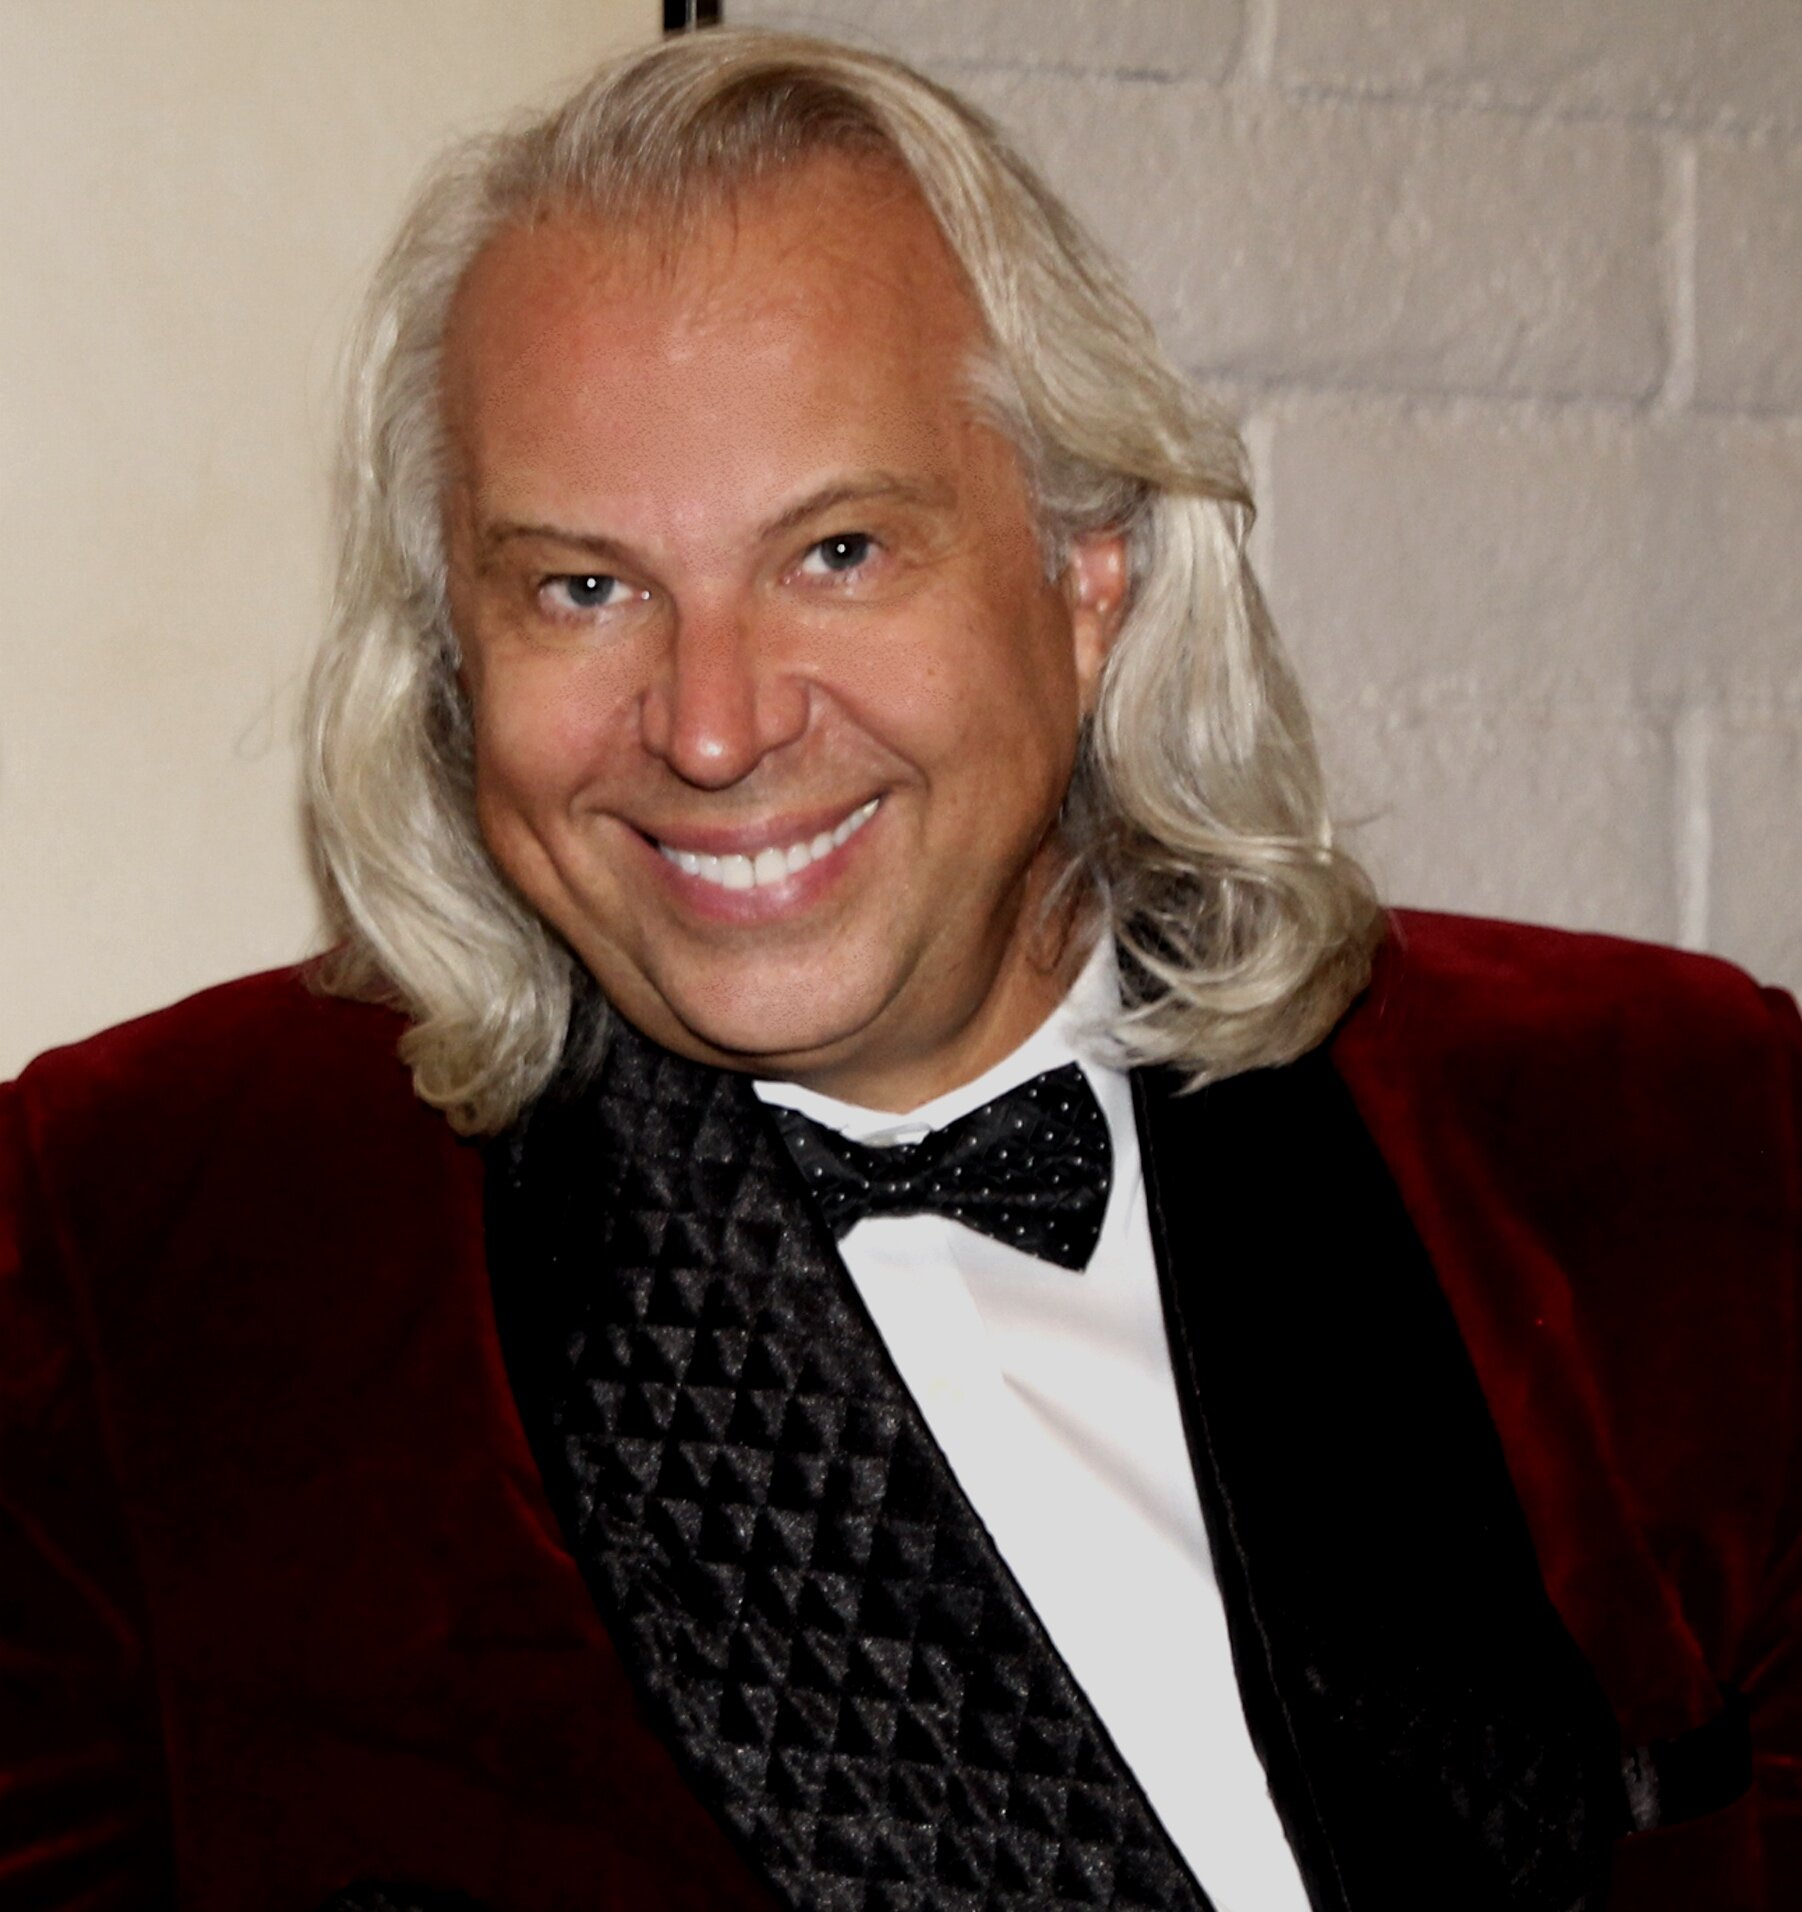 Dale Tyczkowski - Owner / Lead Designer